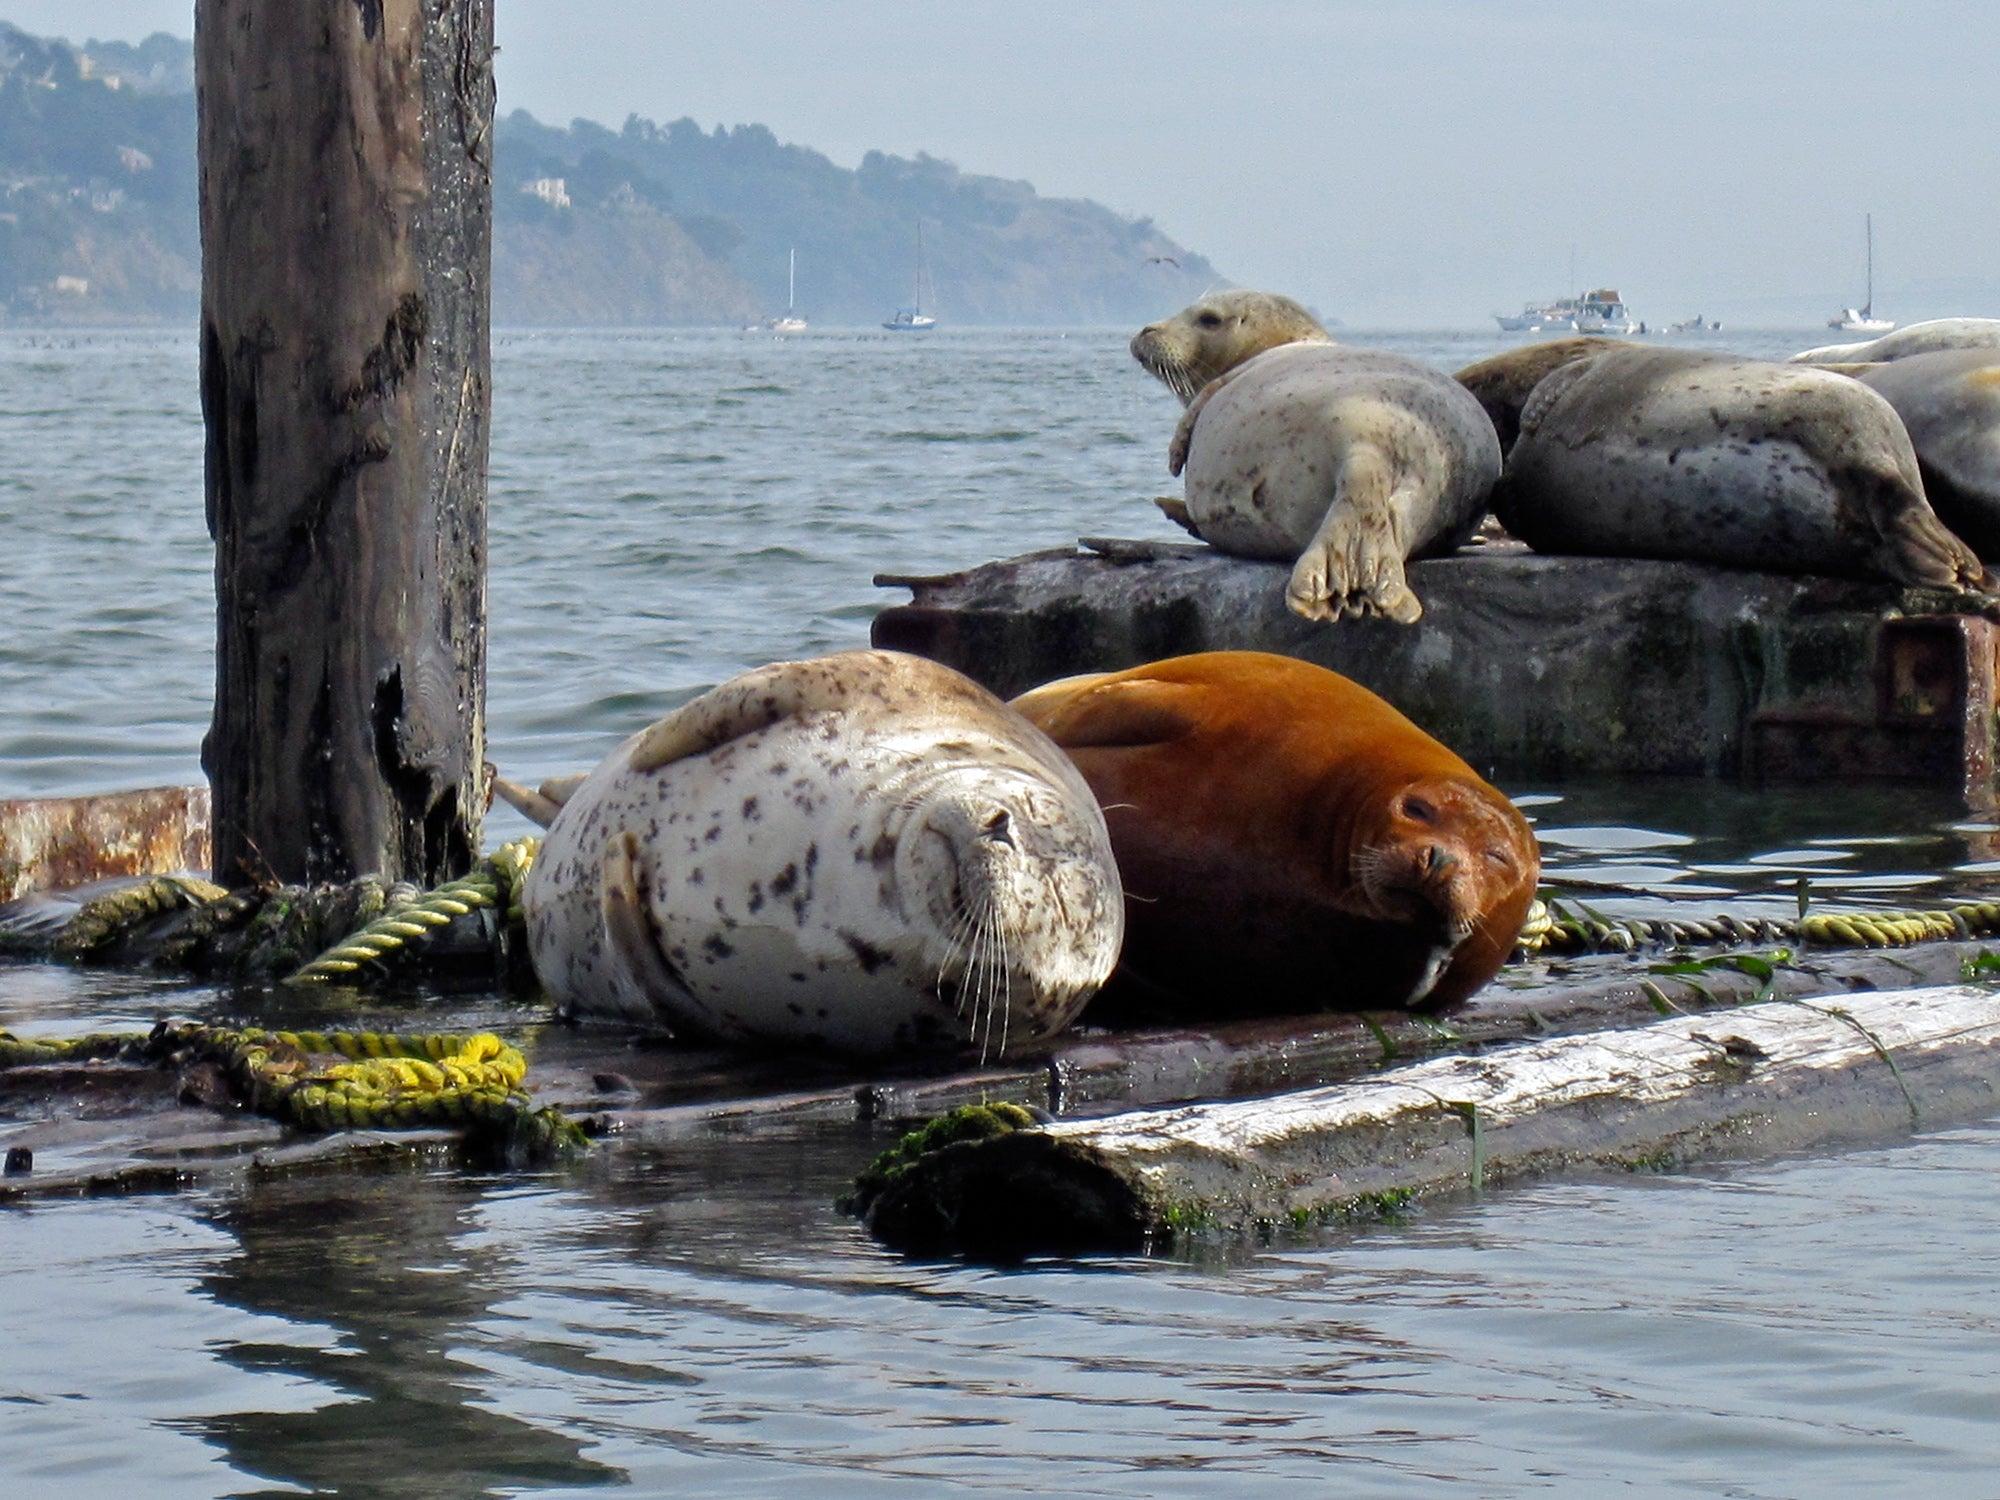 Harbor seals in Sausalito